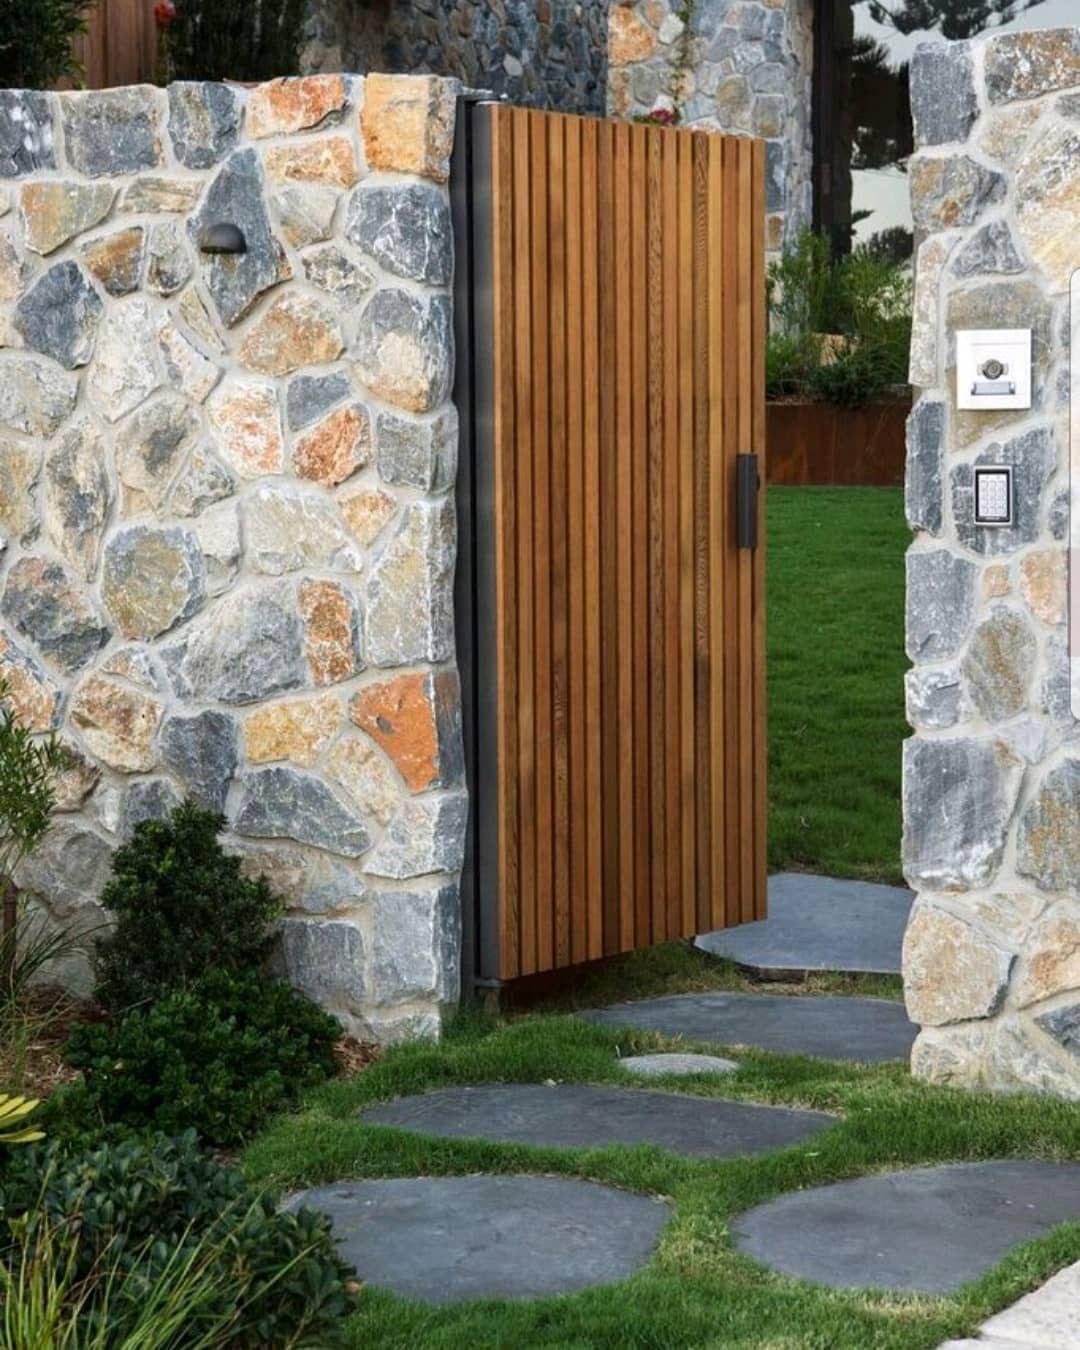 Natural Exterior Decorative Wall Stone Types Of Natural Slate Stones For Exterior Wall House Cultured Stone Natu Stone Cladding Stone Tile Wall Wall Exterior